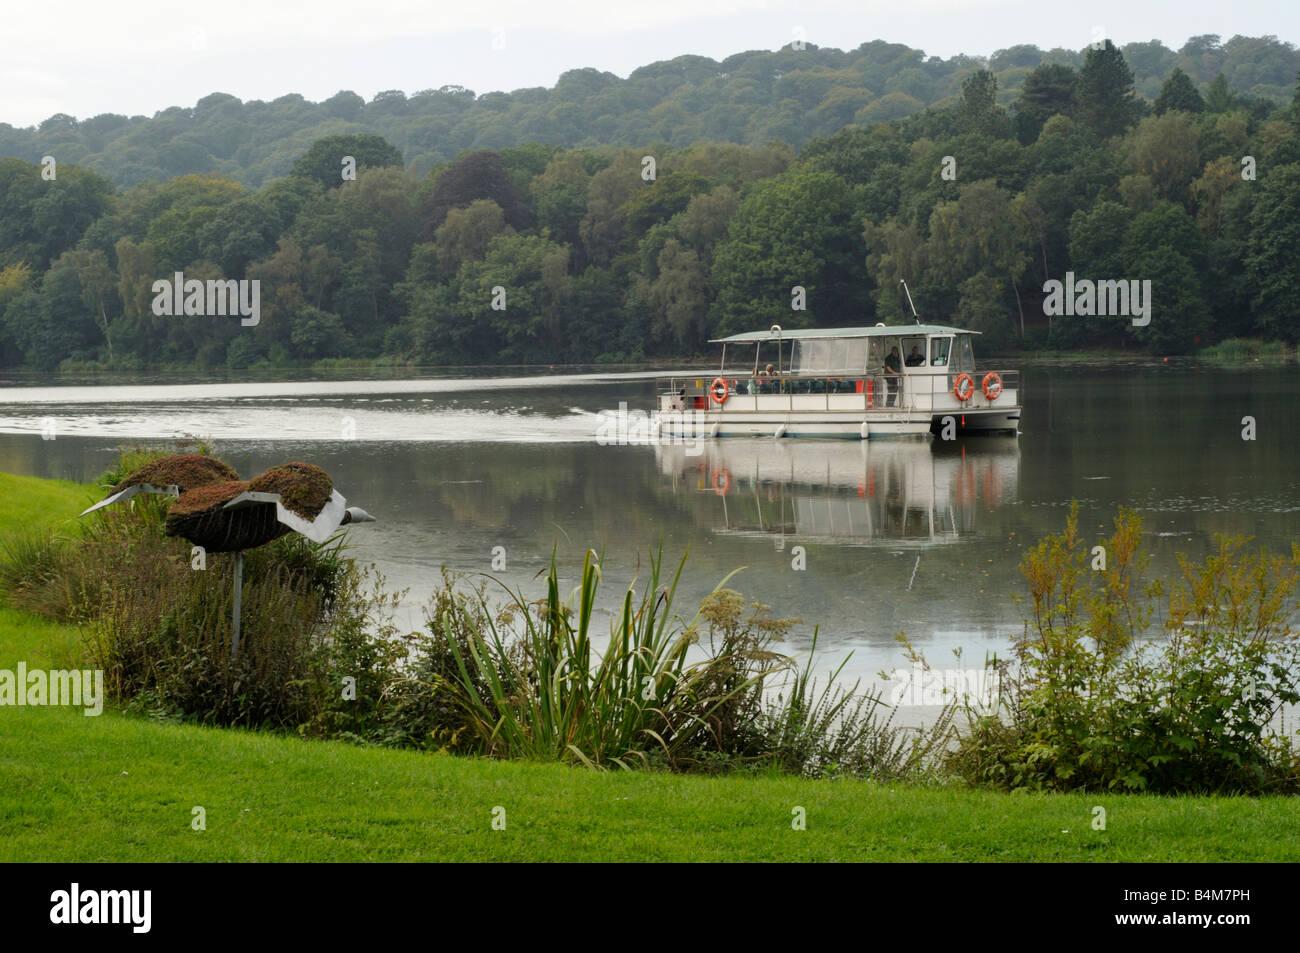 Miss Elizabeth boat at Trentham Gardens - Stock Image